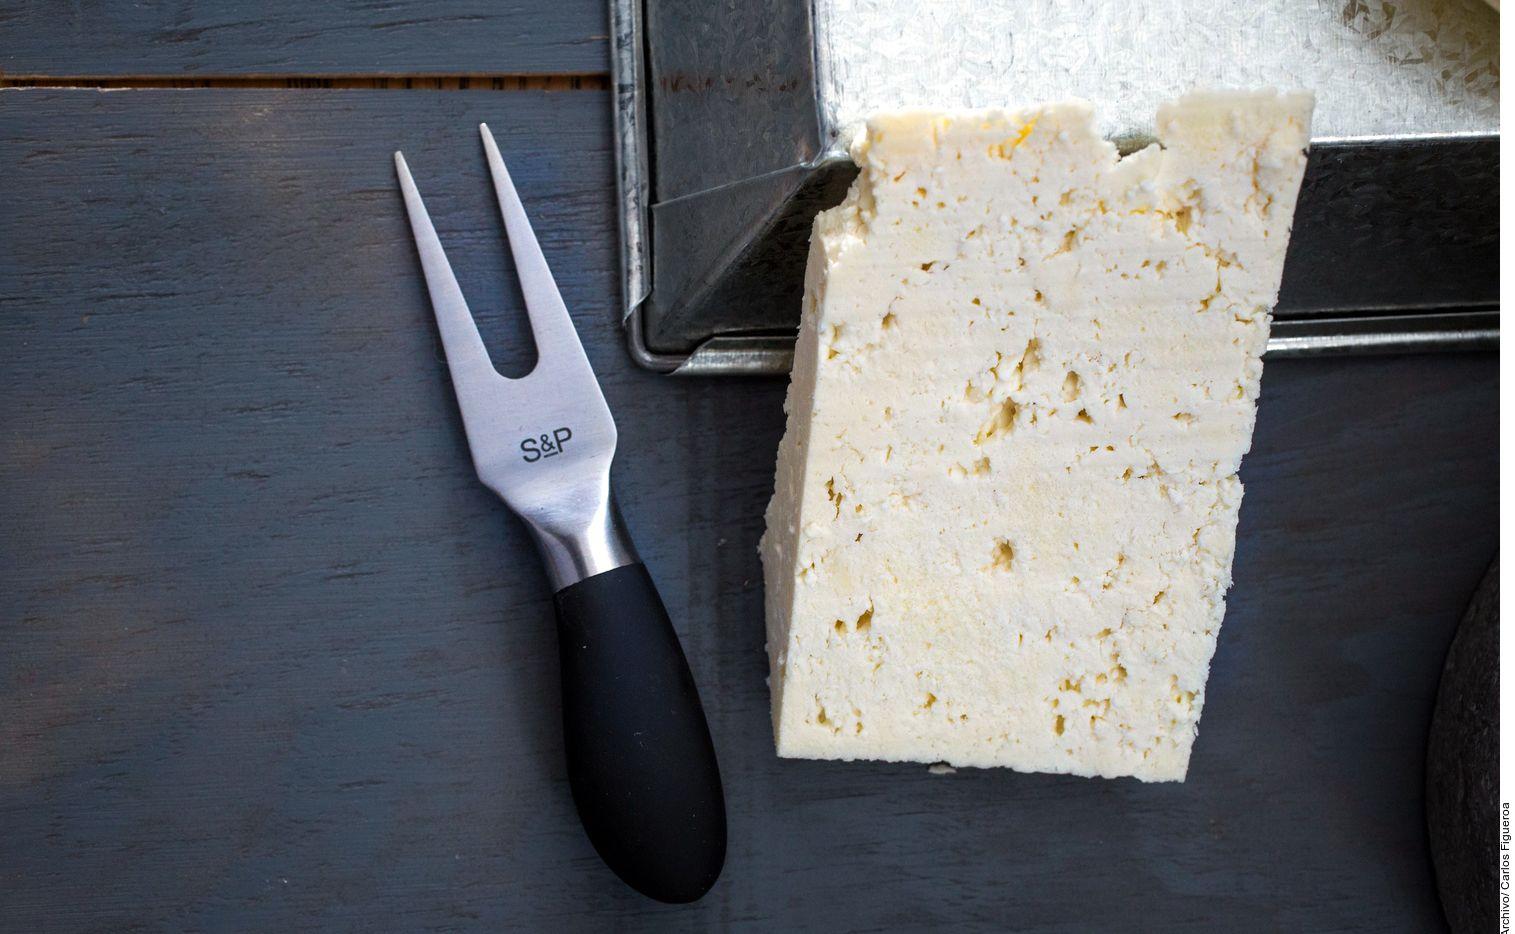 Aquellos quesos que tienen notas a amoniaco o a leche agria deben ser rechazados, aconsejan los expertos. (AGENCIA REFORMA)